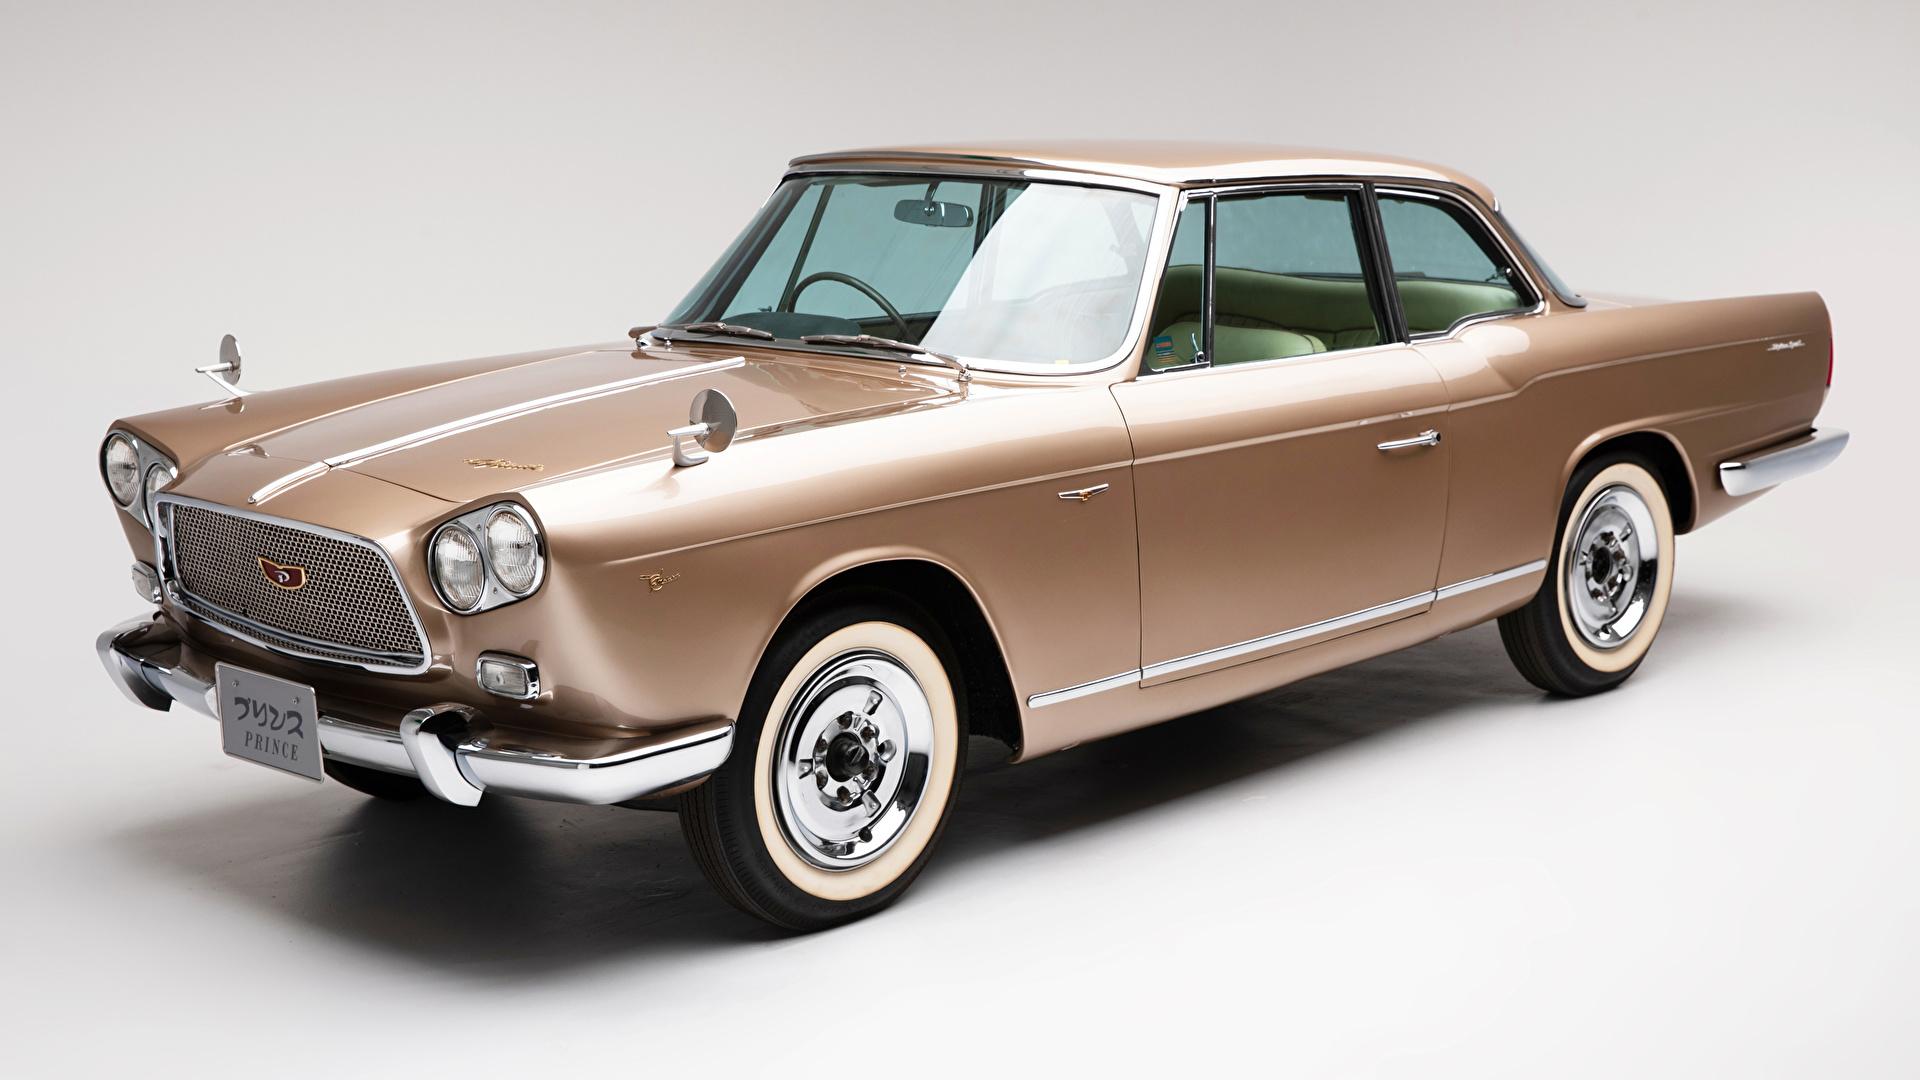 Картинки Ниссан 1961-63 Prince Skyline Sports Coupe Michelotti Ретро авто Металлик сером фоне 1920x1080 Nissan винтаж старинные машина машины автомобиль Автомобили Серый фон